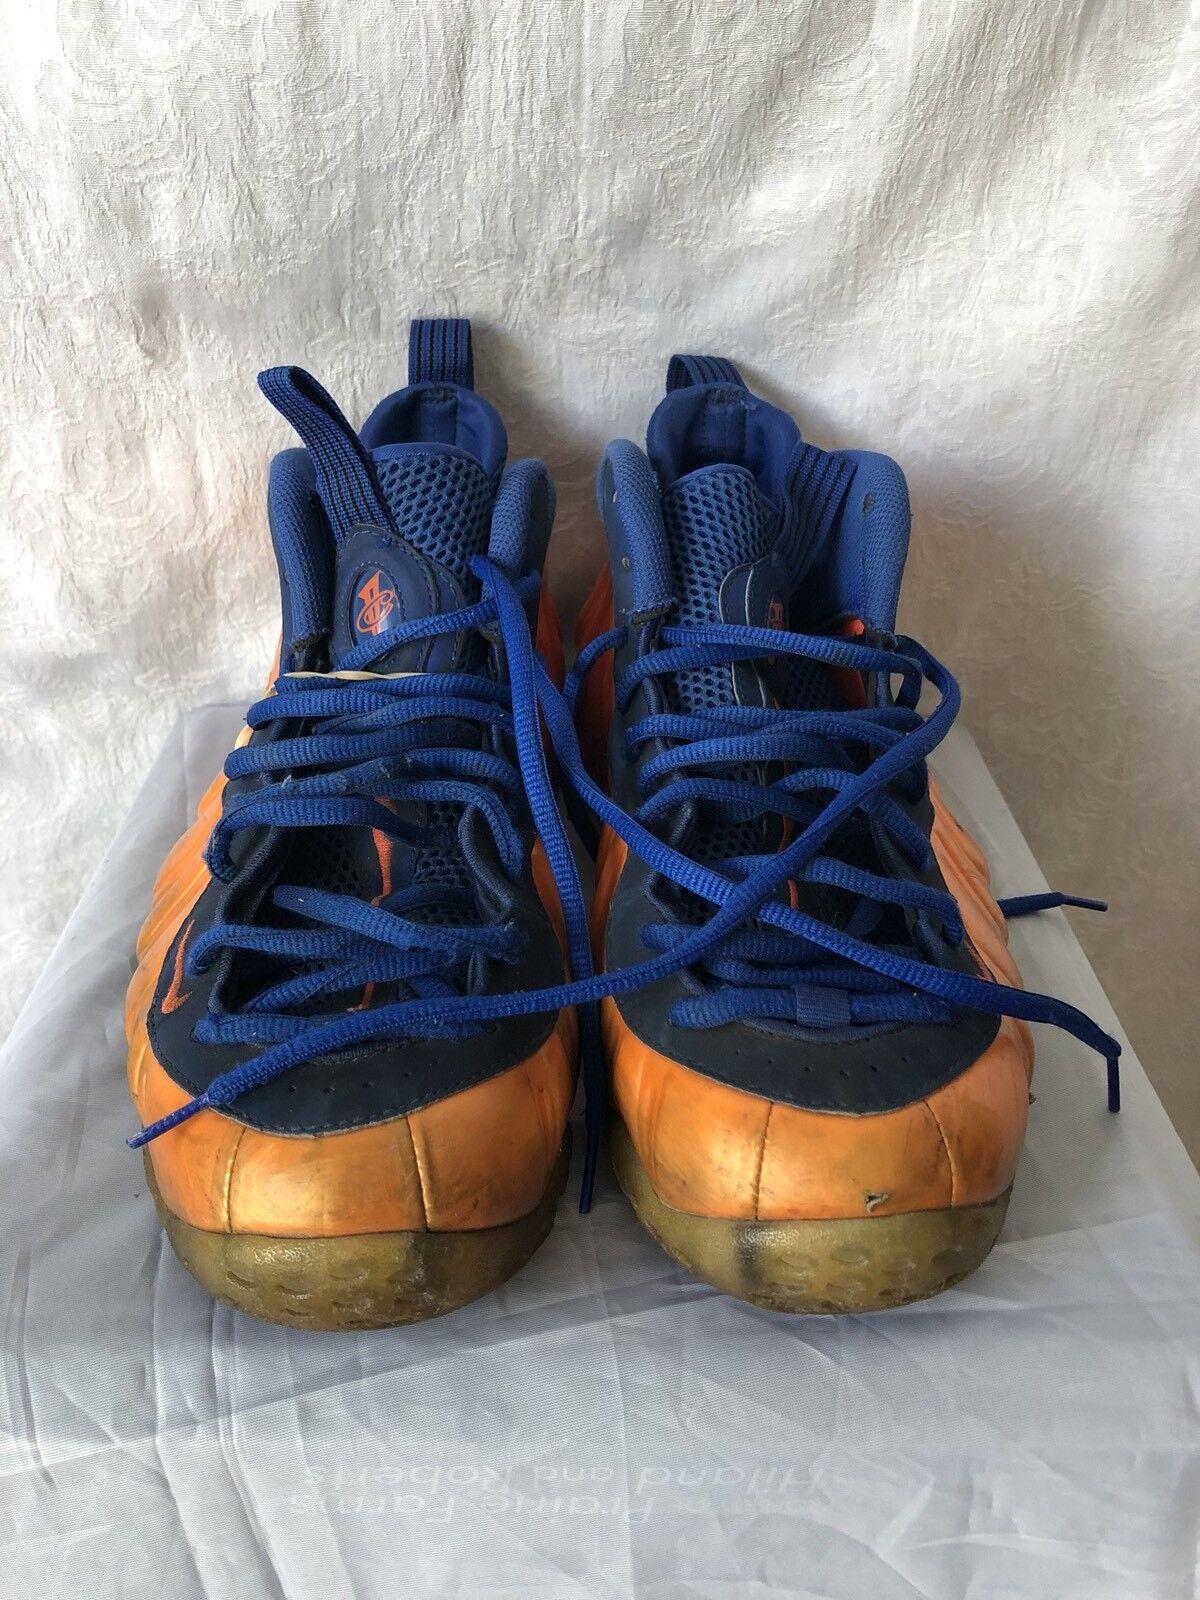 nike foamposite orange größe - blauen knicks mens größe orange 12 basketball - schuhe 314996-801 94b462